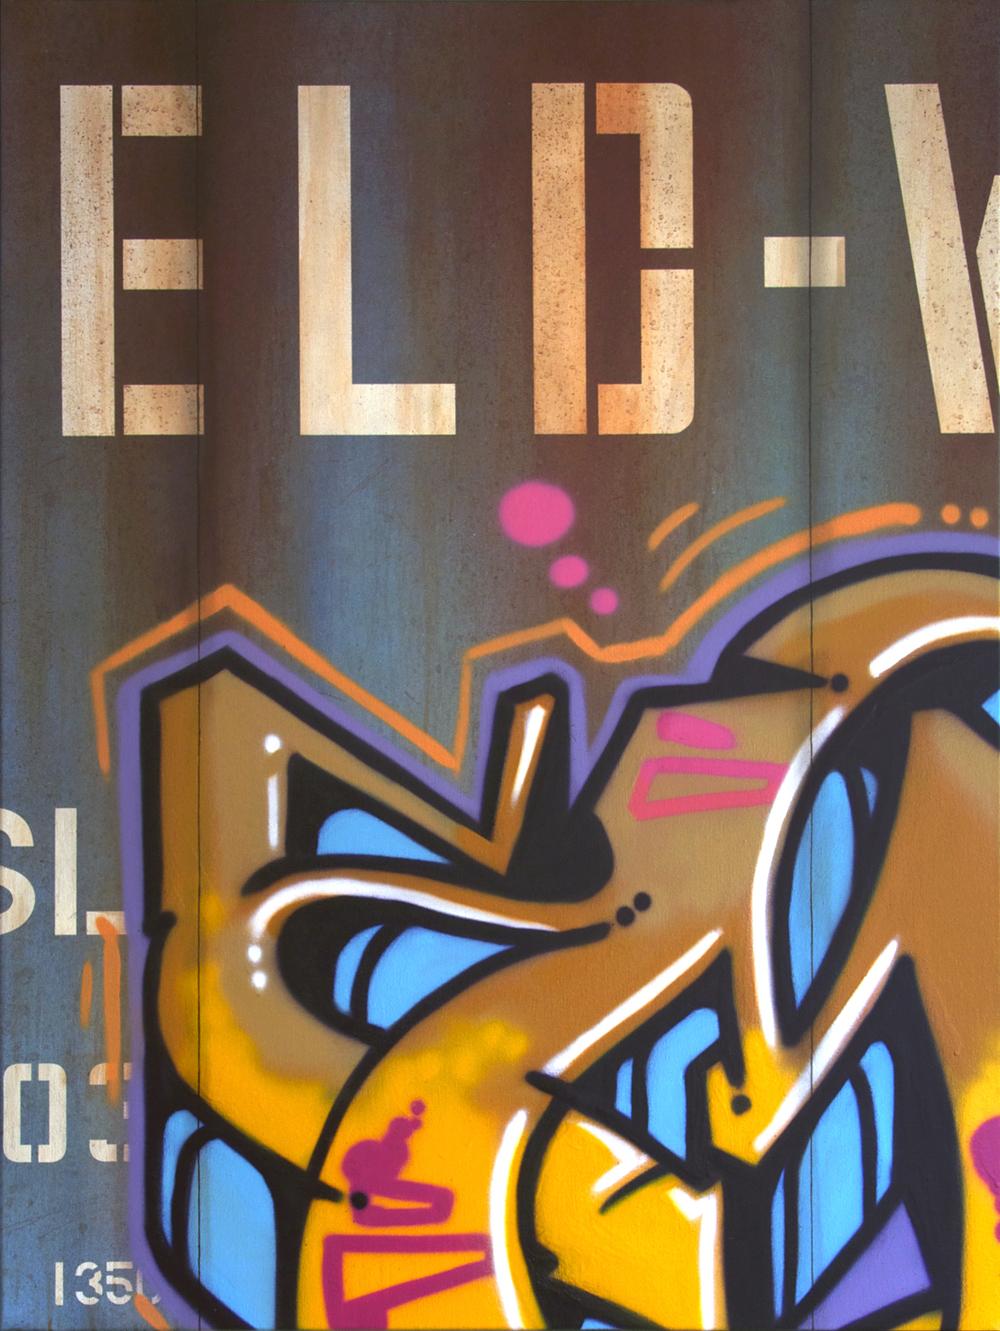 Blank Canvas #58 - JELD-WEN